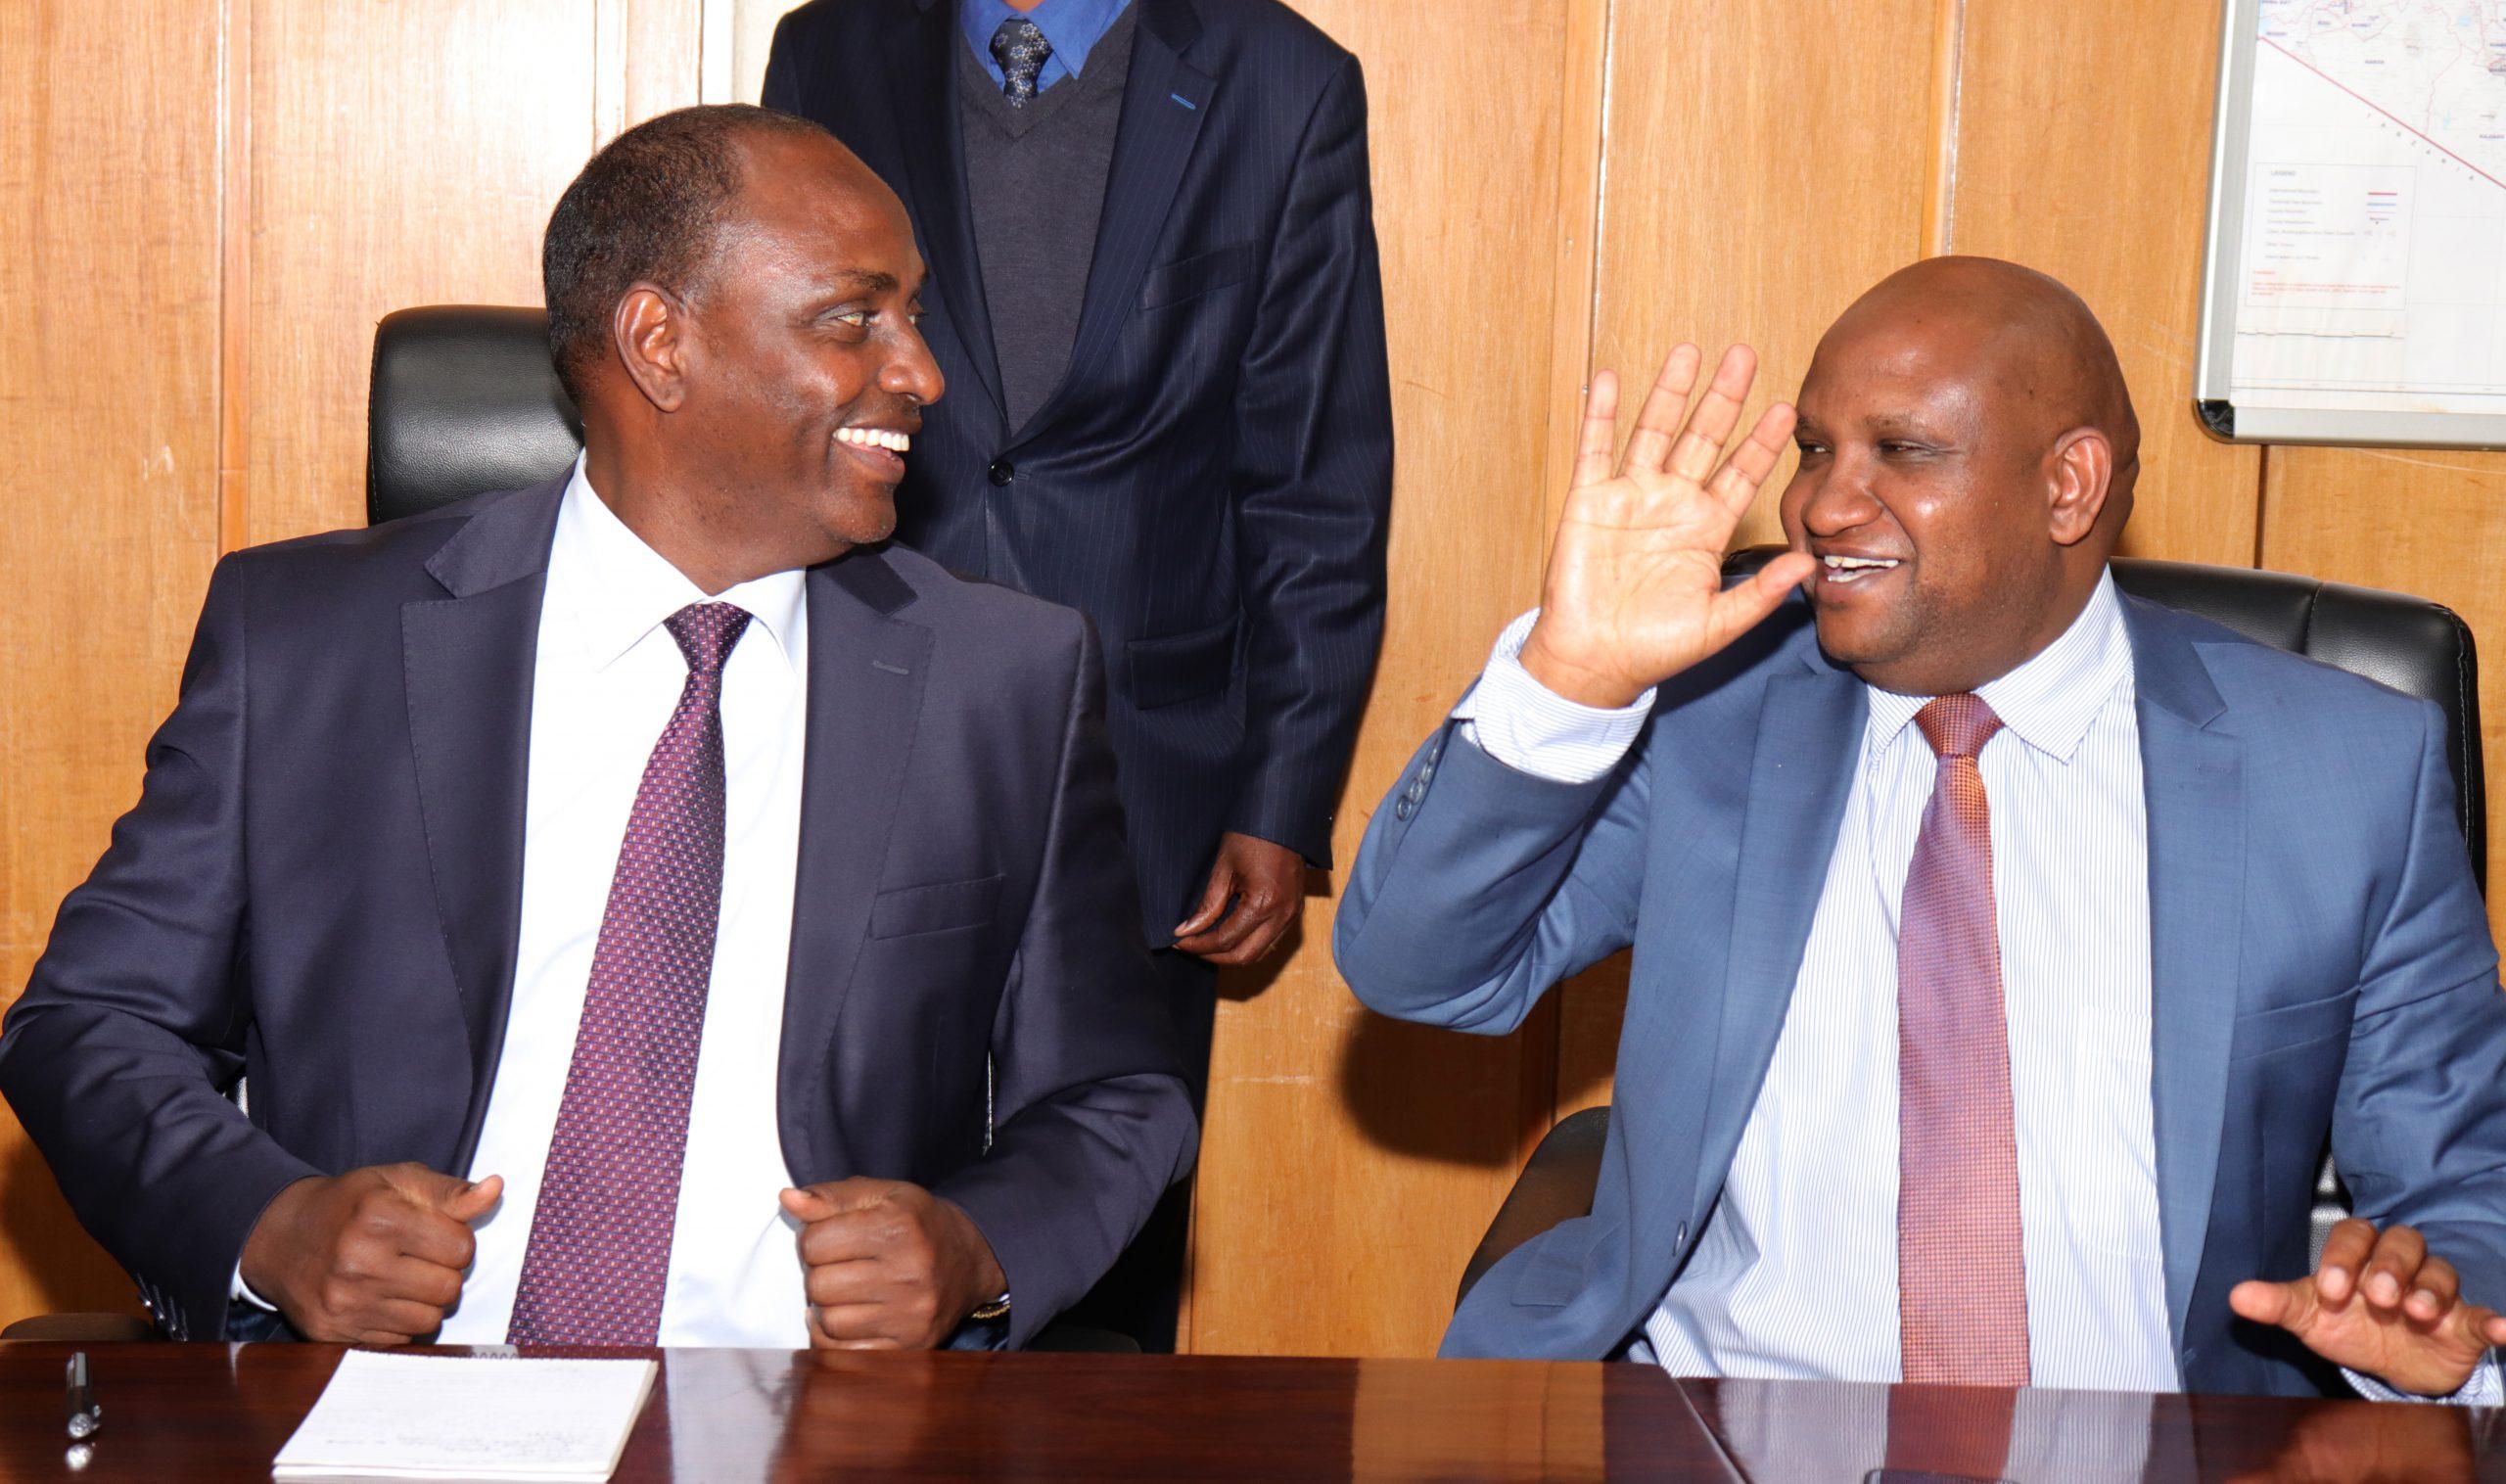 Acting National Treasury CS Ukur Yattani with KRA Commissioner General Githii Mburu at Treasury Buildings